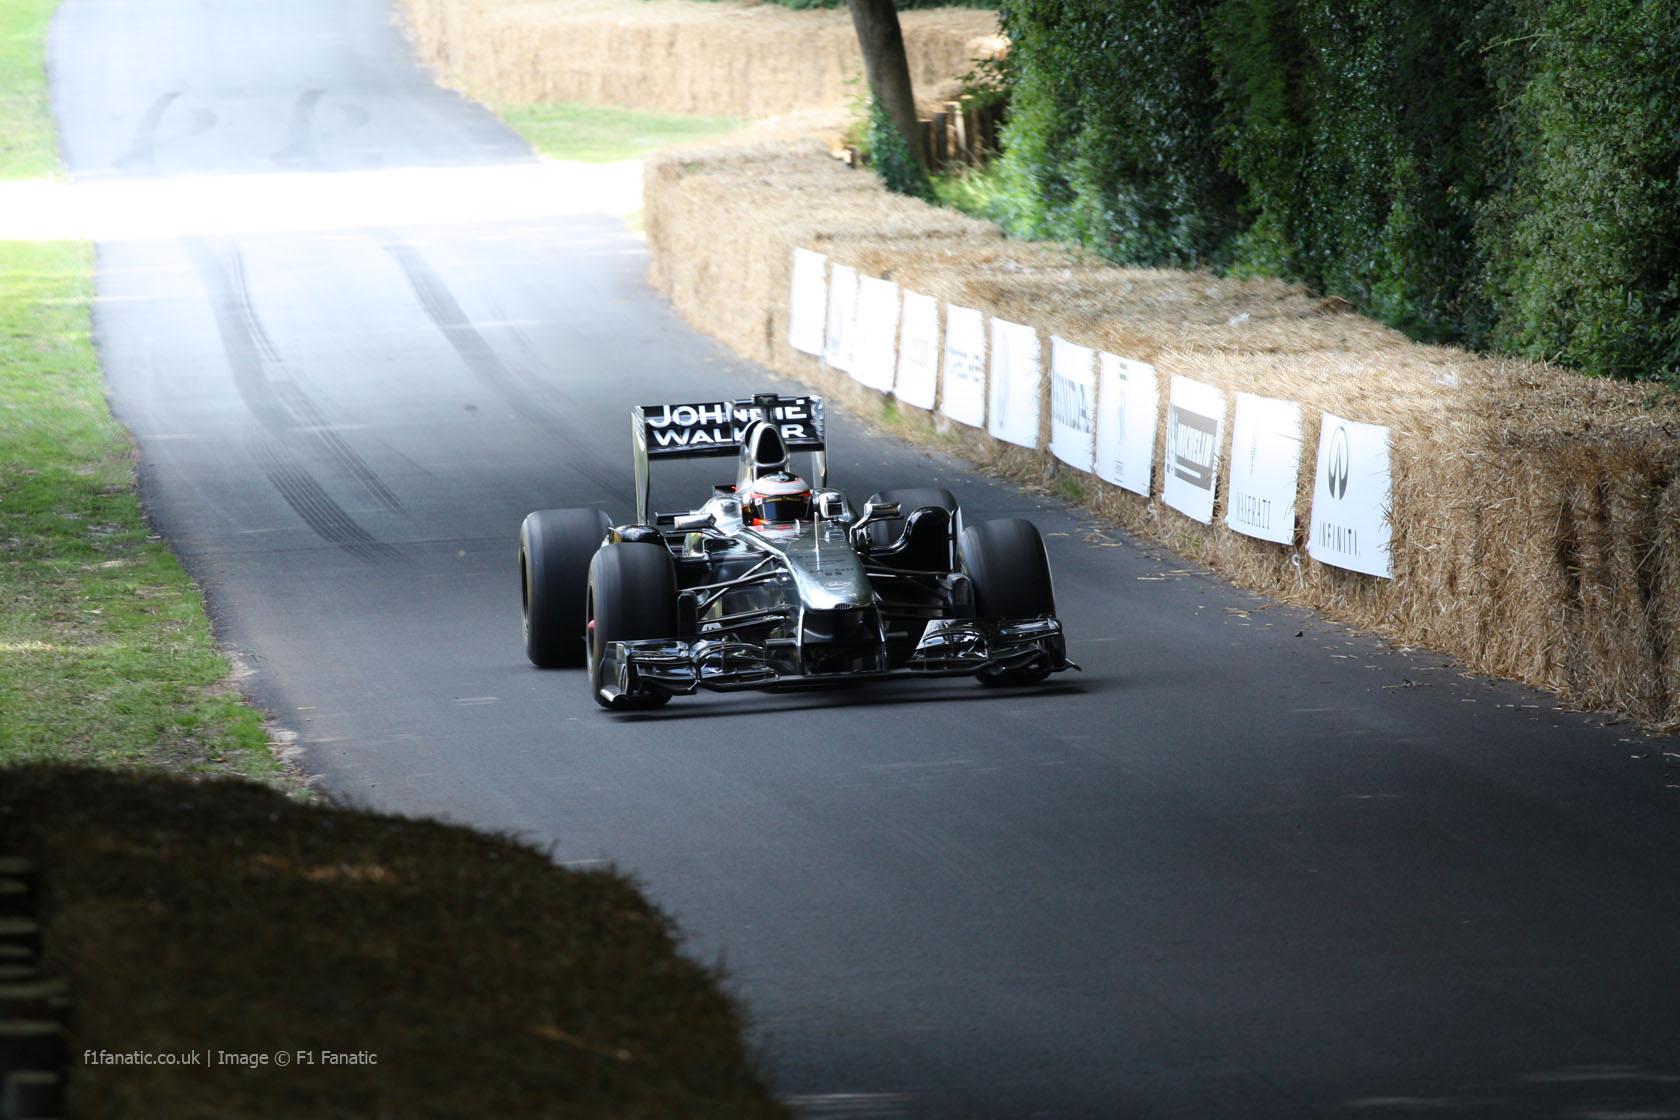 McLaren MP4-26 (1), Goodwood Festival of Speed, 2014